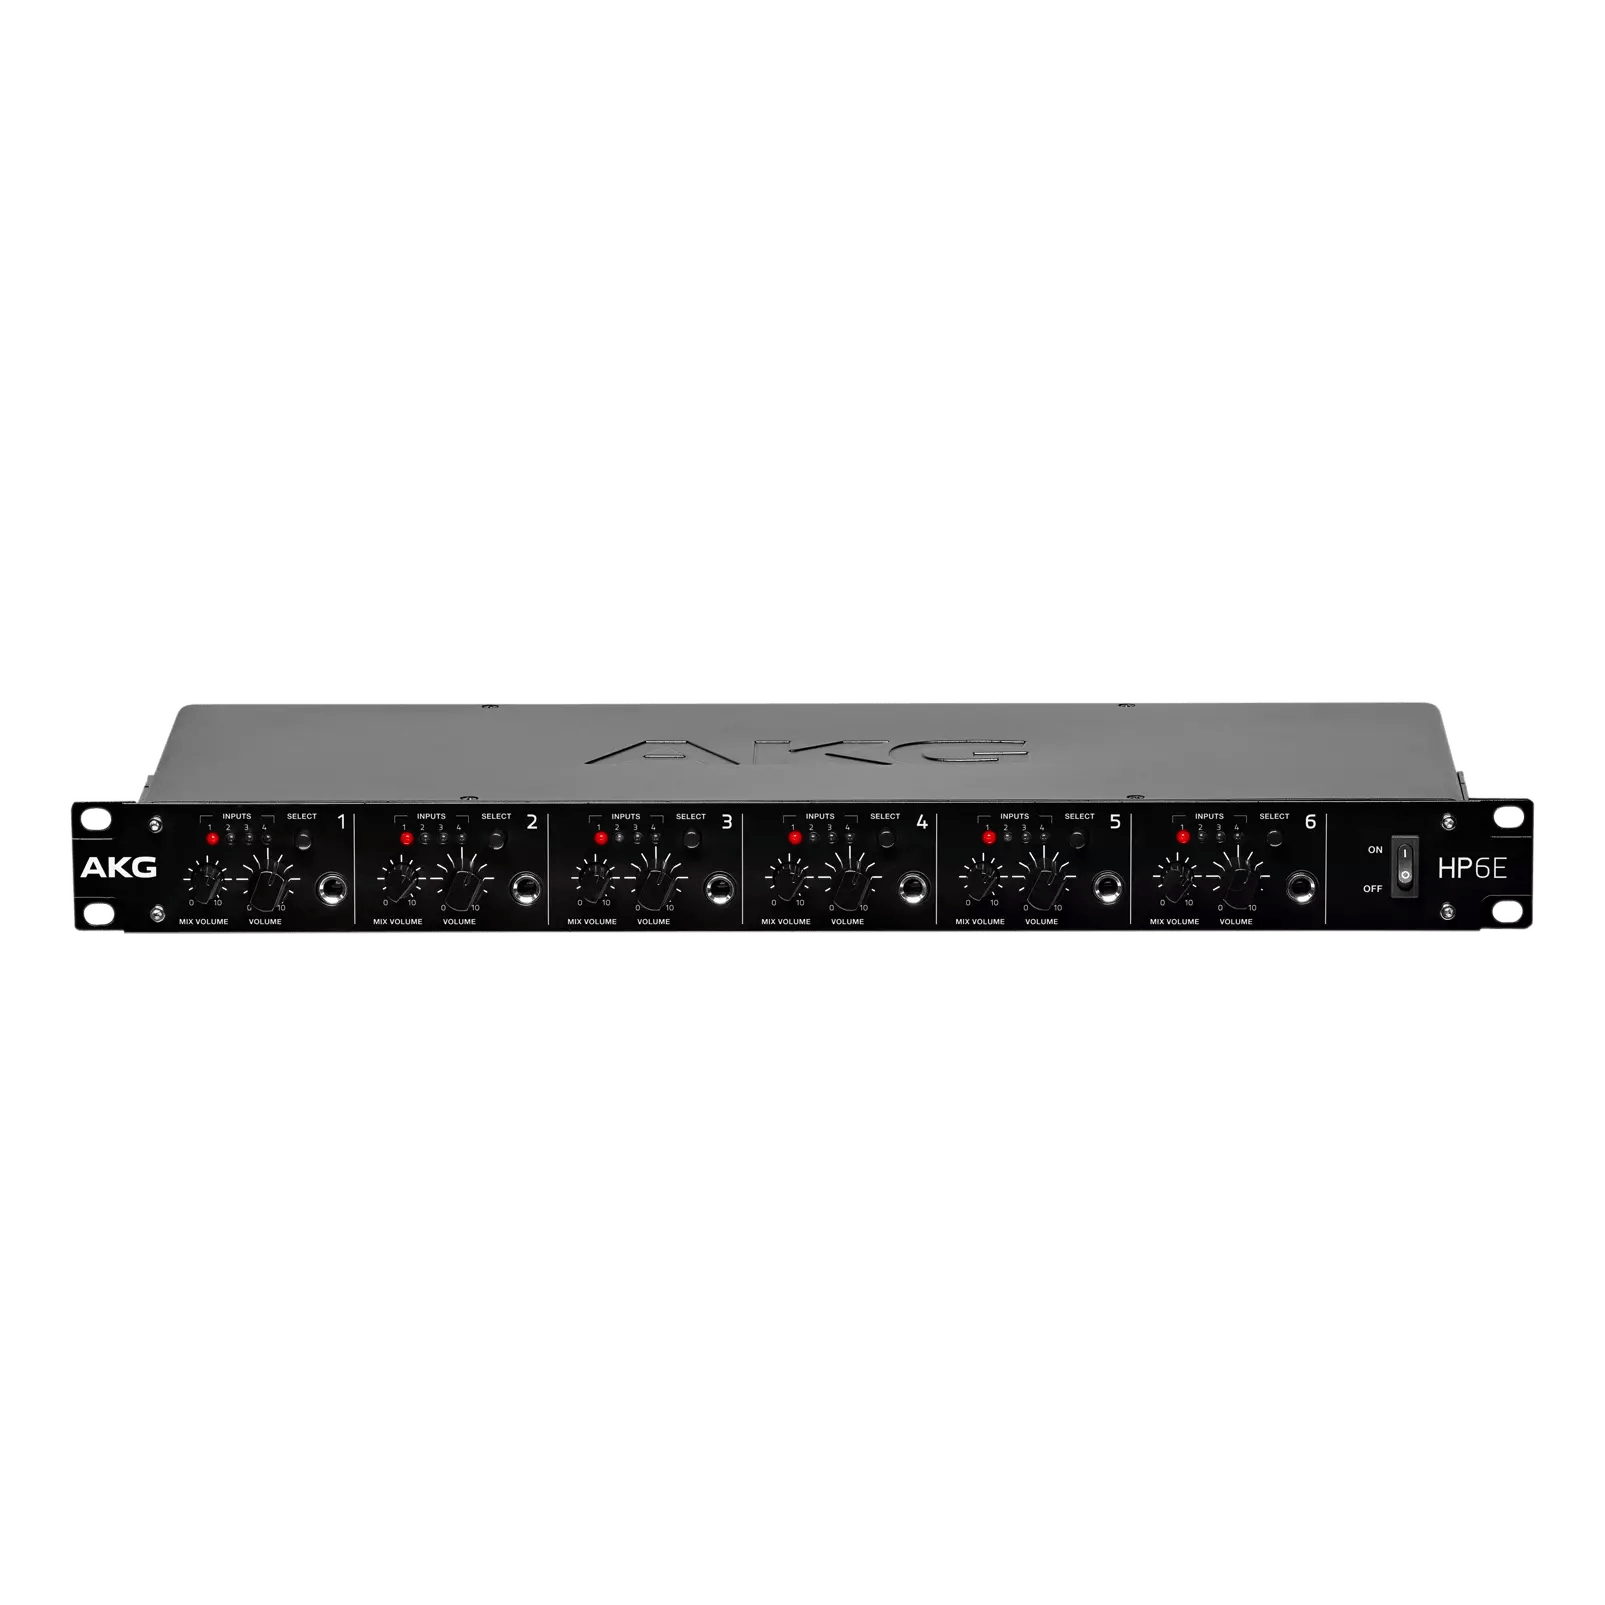 hp6e 6 channel matrix headphone amplifier headphone amp v10 schematic [ 1605 x 1605 Pixel ]